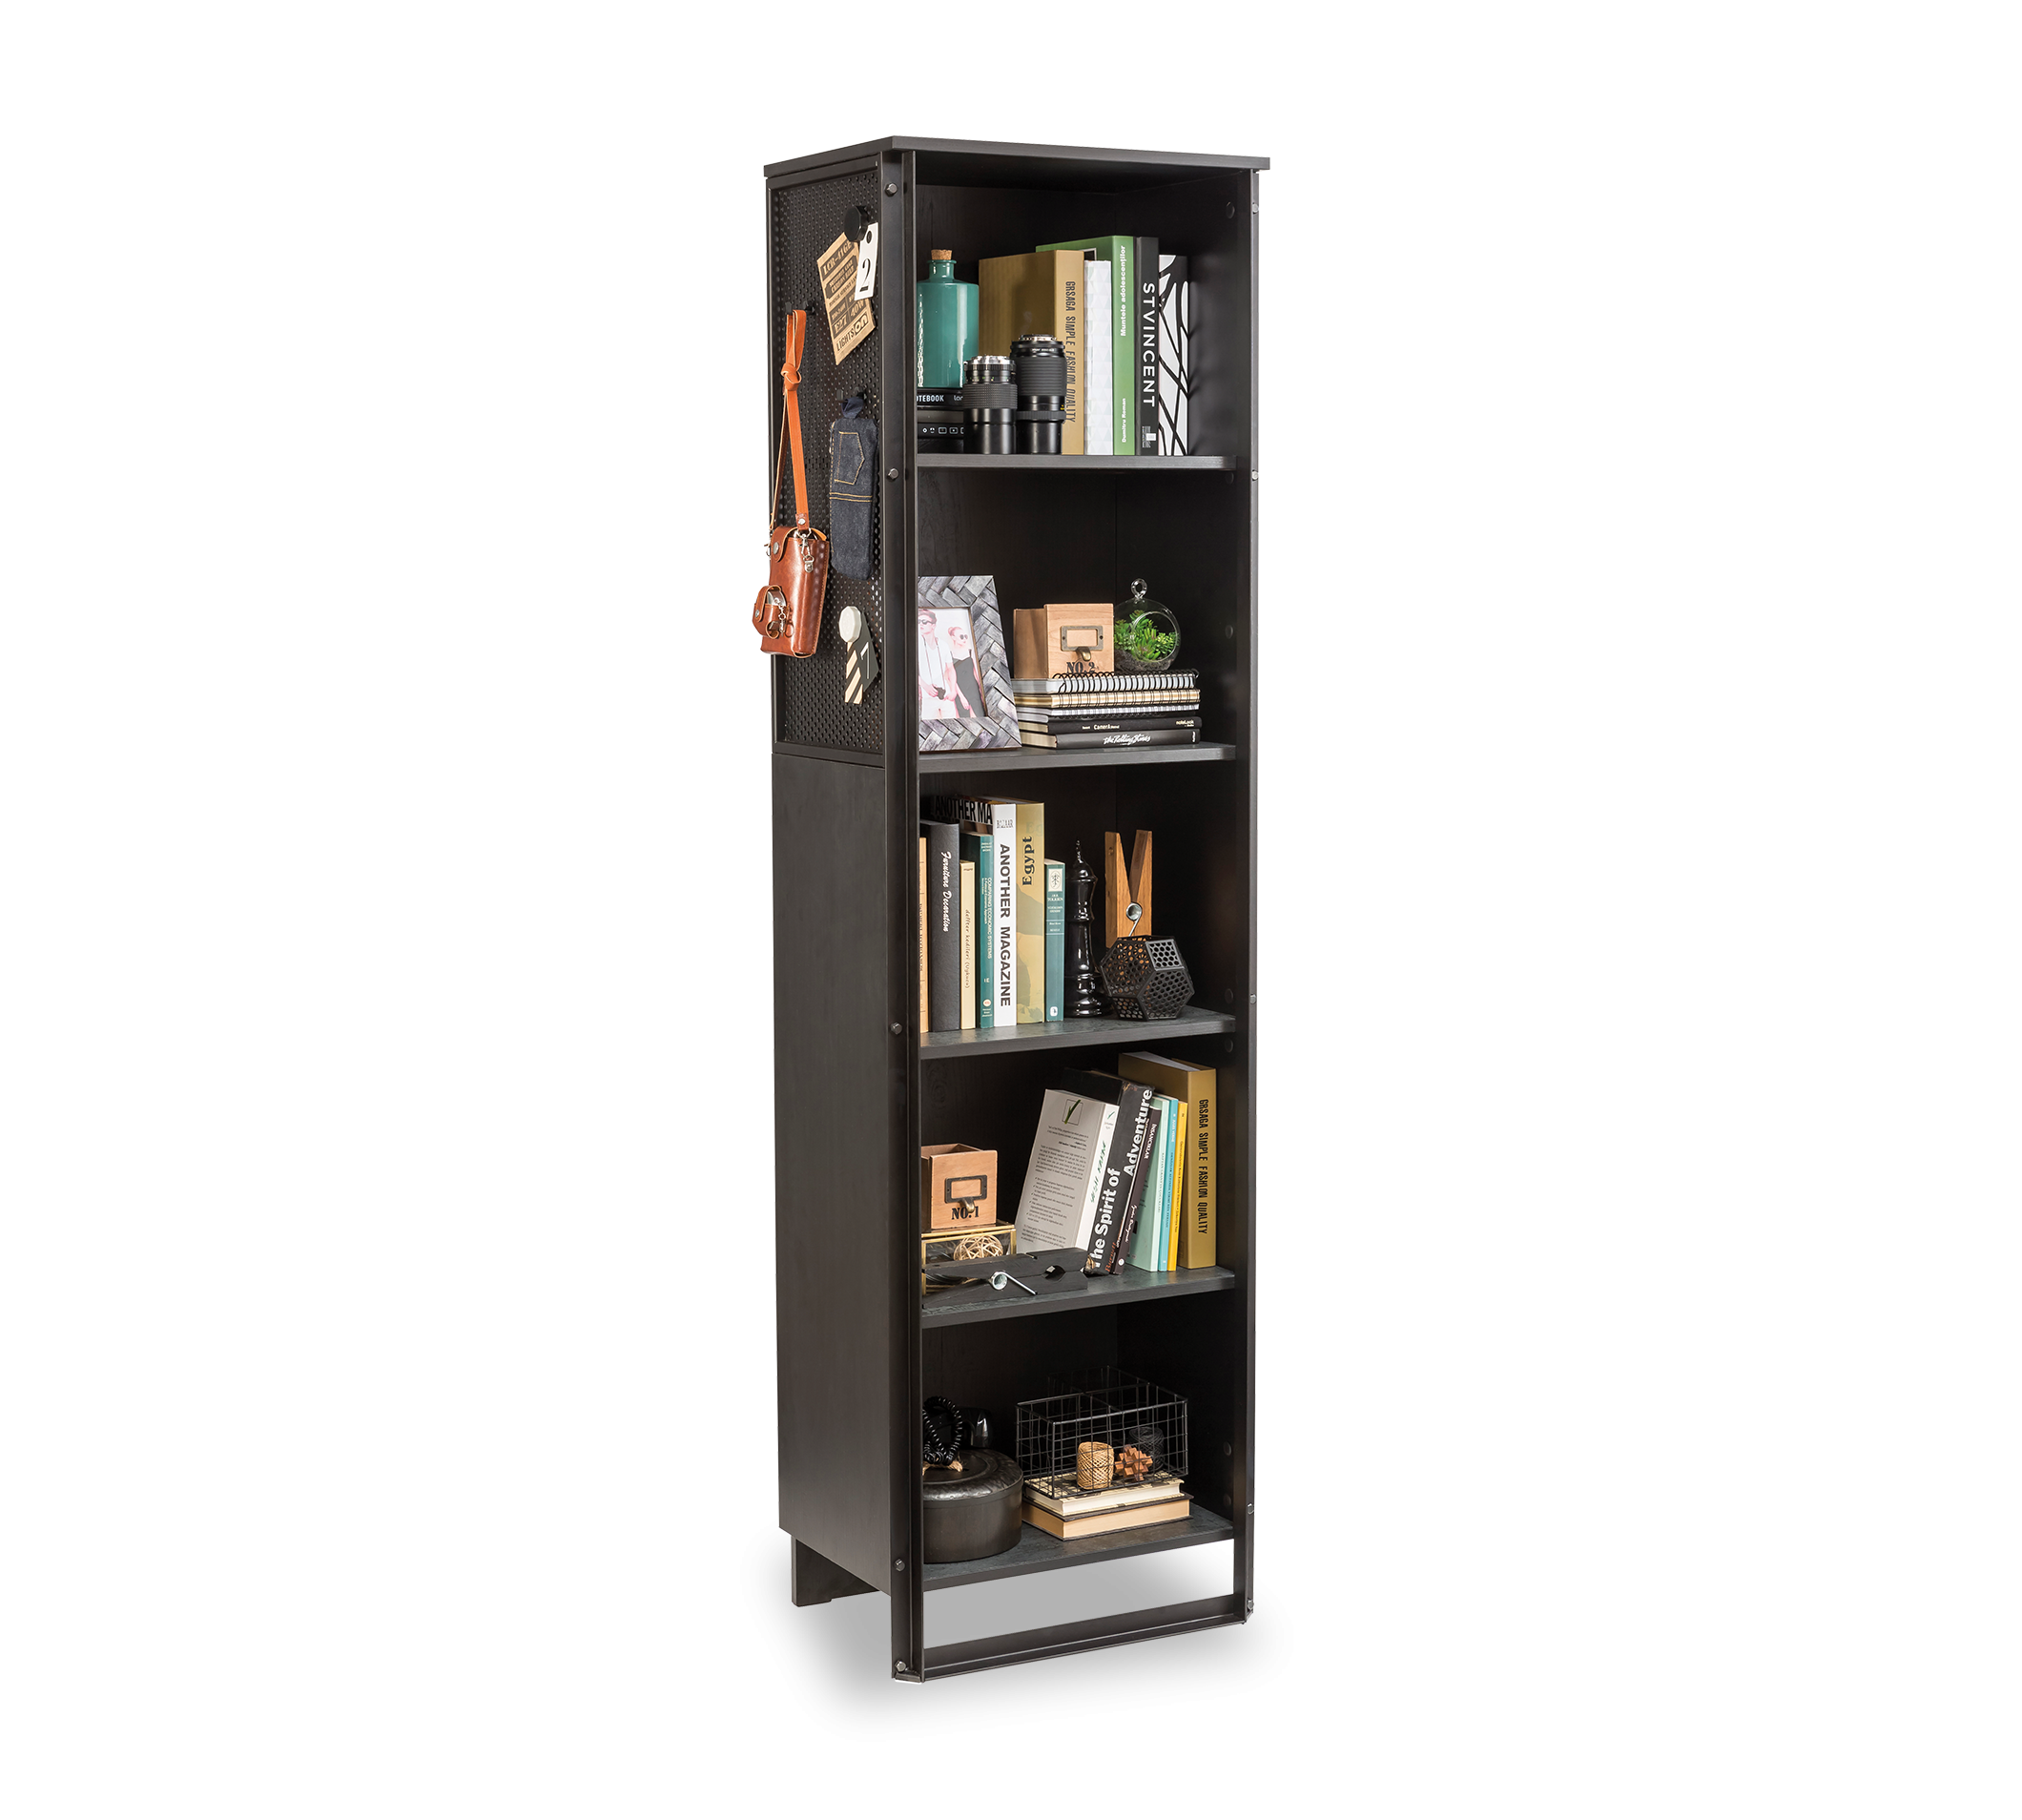 Biblioteca din pal si metal pentru tineret Dark Metal New Black / Graphite, l53xA35xH180 cm